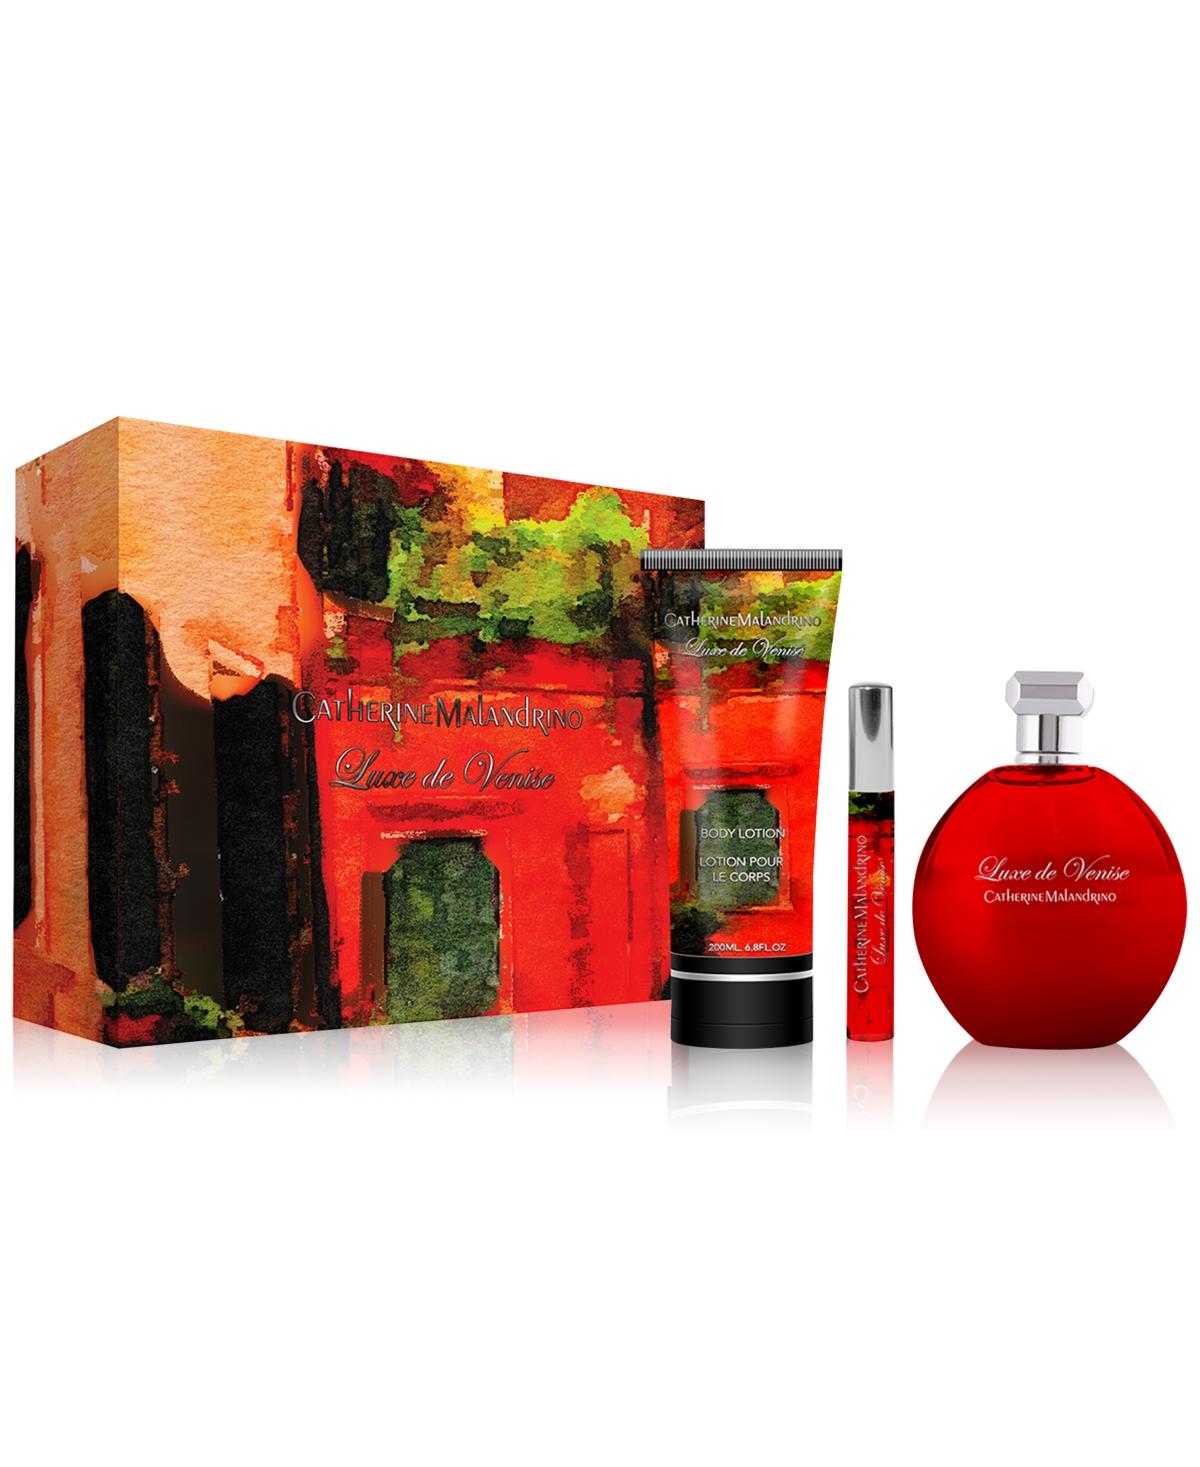 Catherine Malandrino 3-Pc. Luxe de Venise Gift Set